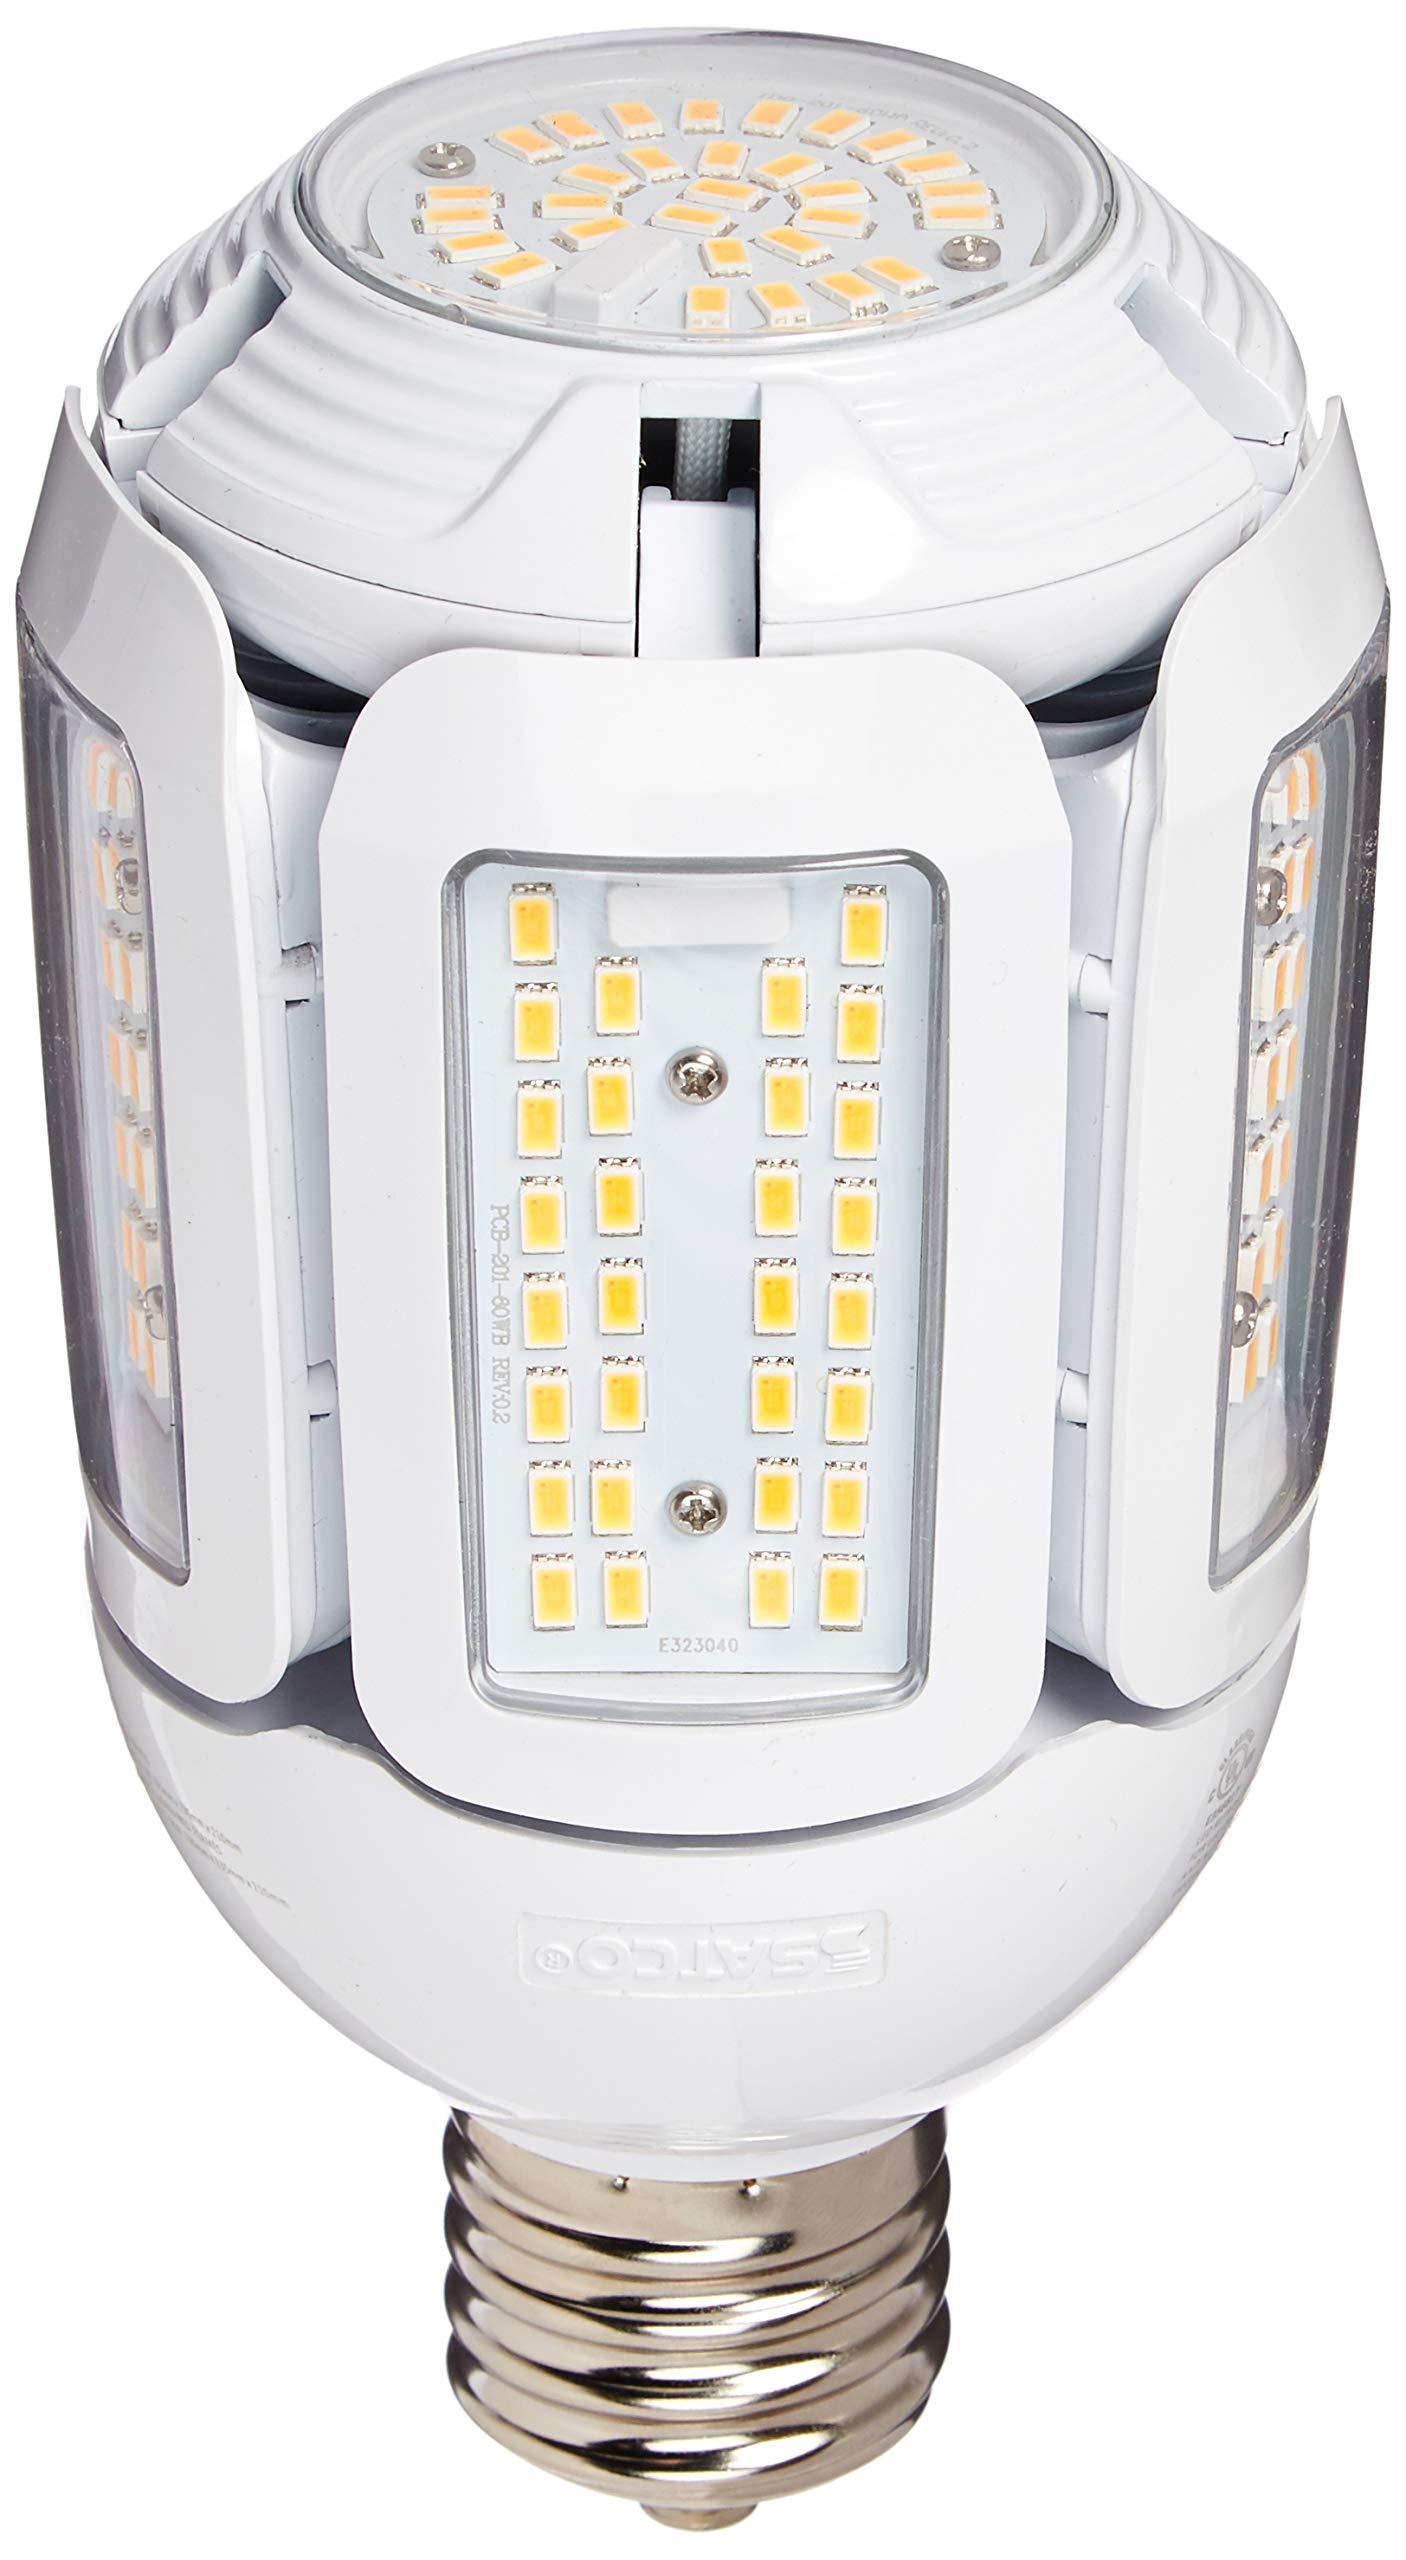 Satco S9799 60 Watt LED Hid Replacement 2700 Kelvin Adjustable Beam Angle 100-277V Light Bulb, Mogul Base (EX39)